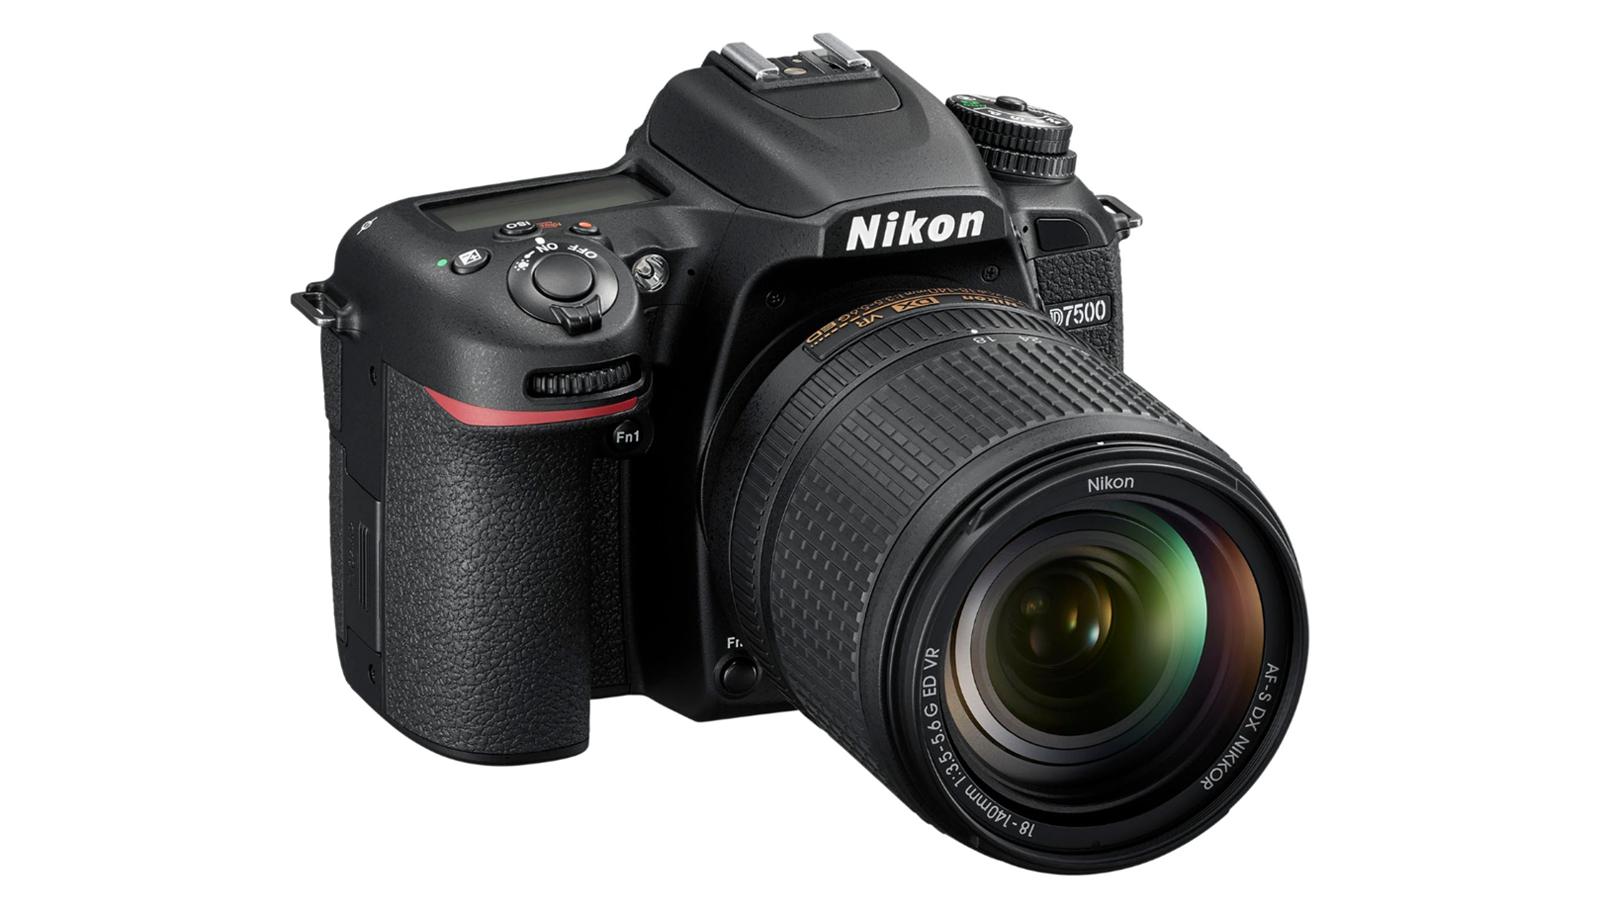 The Nikon D7500.